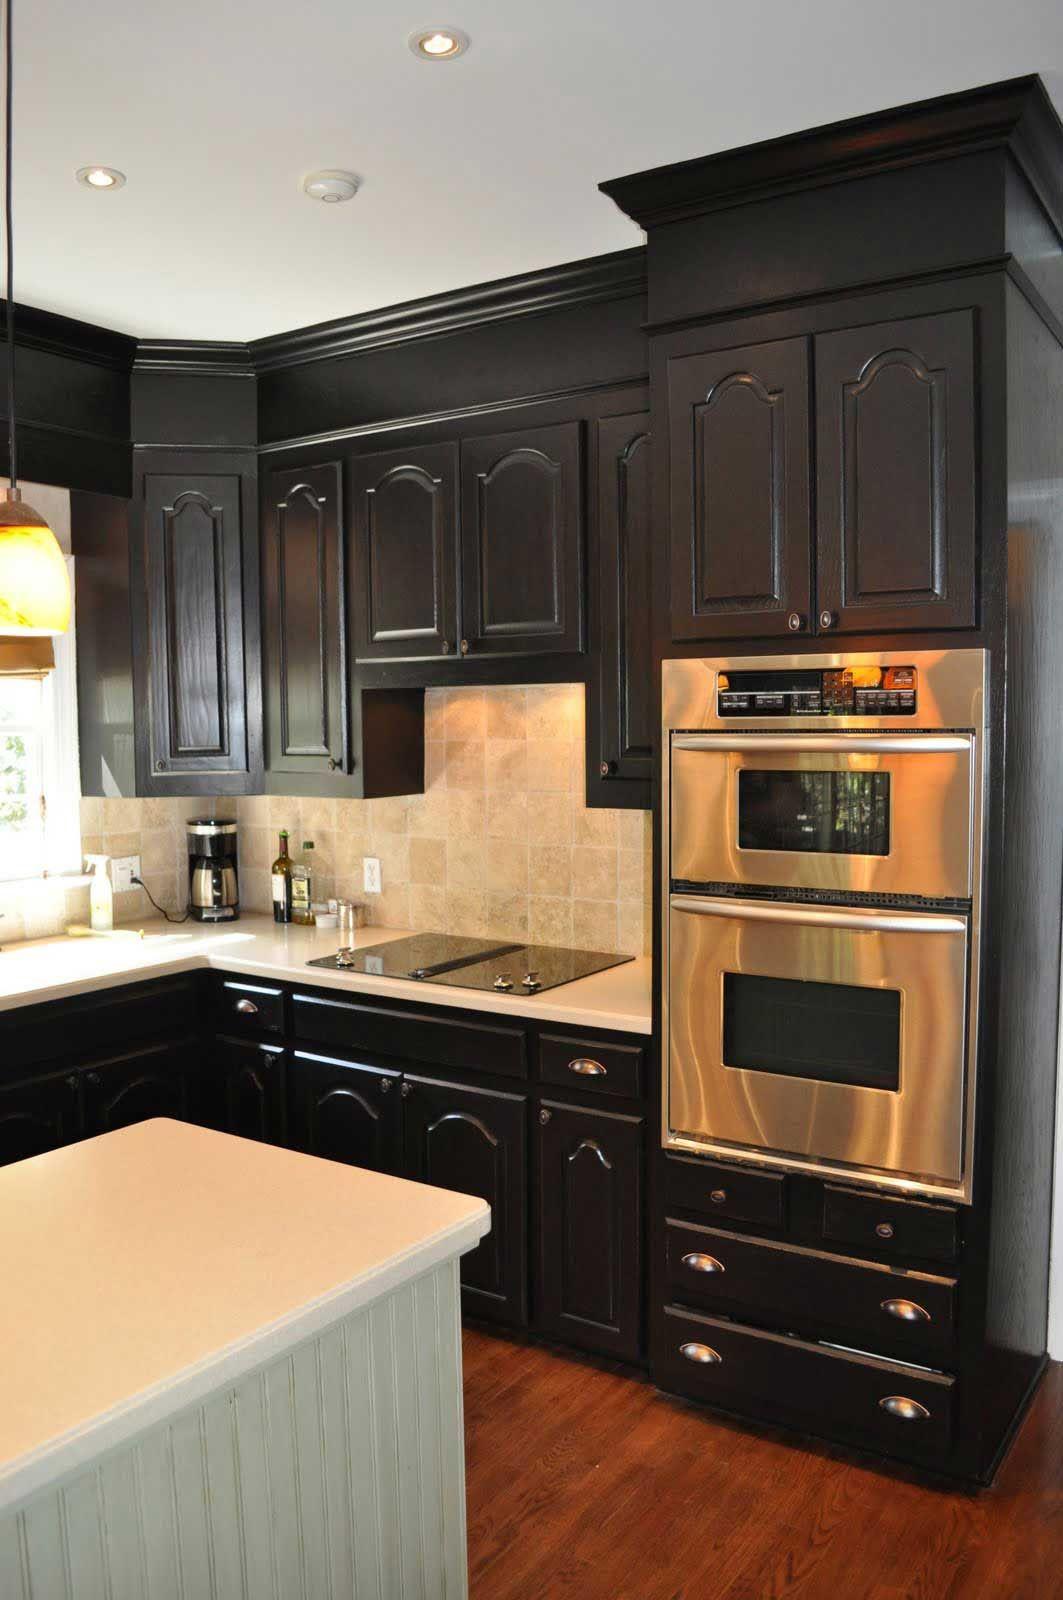 17 Resplendent Black Kitchen Ceiling To Bring Unique Look Kitchen Design Small Home Kitchens Kitchen Soffit